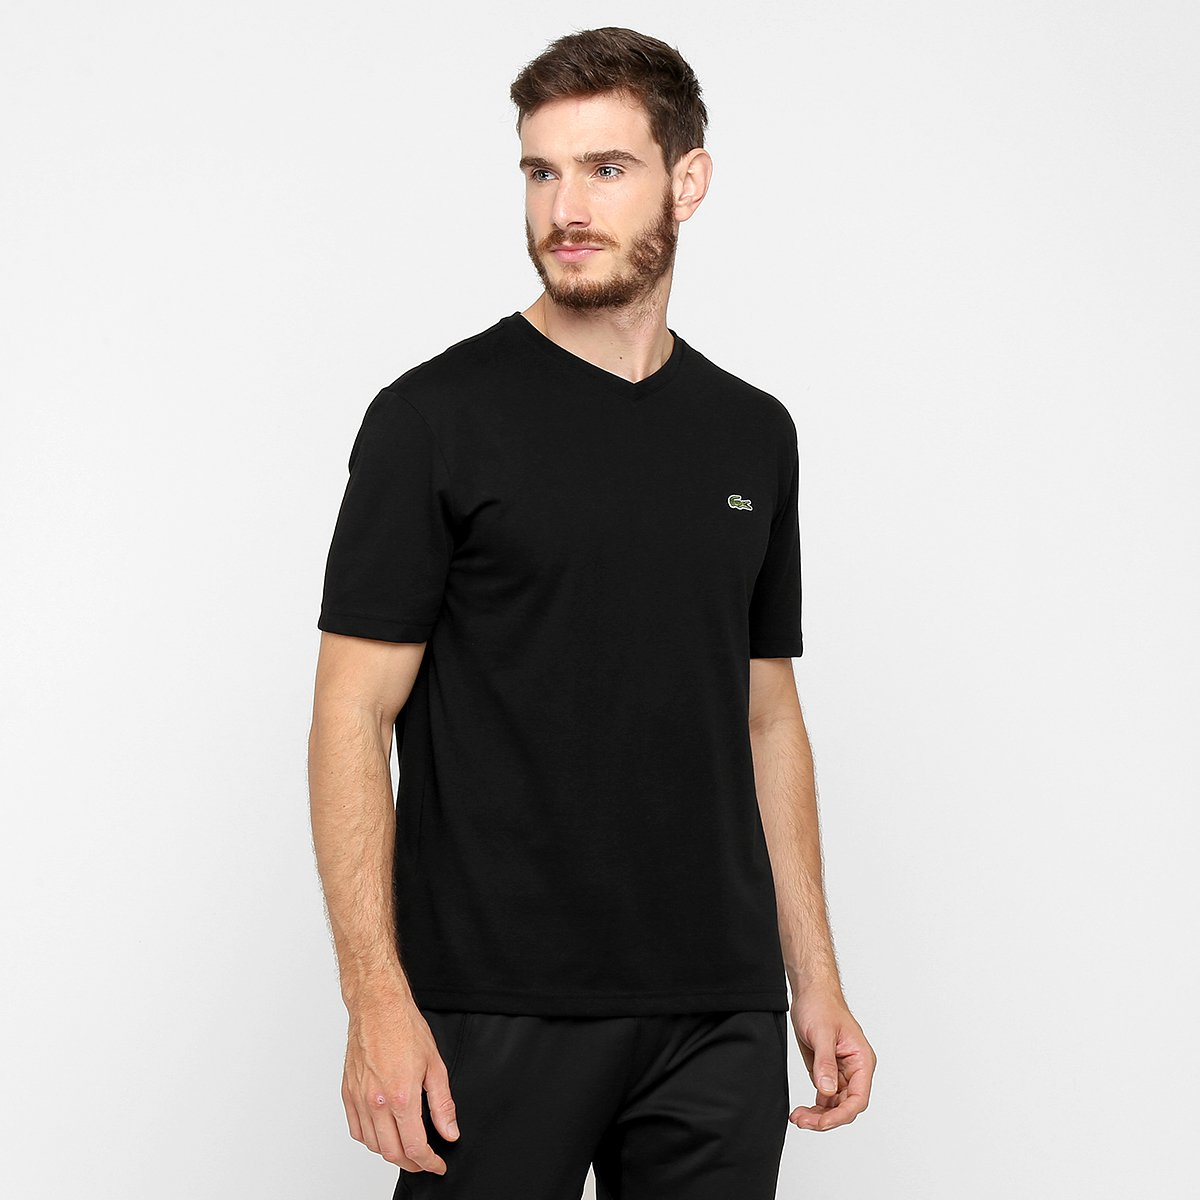 dae0a51fbb390 Camiseta Lacoste Gola V Masculina - Preto - Compre Agora